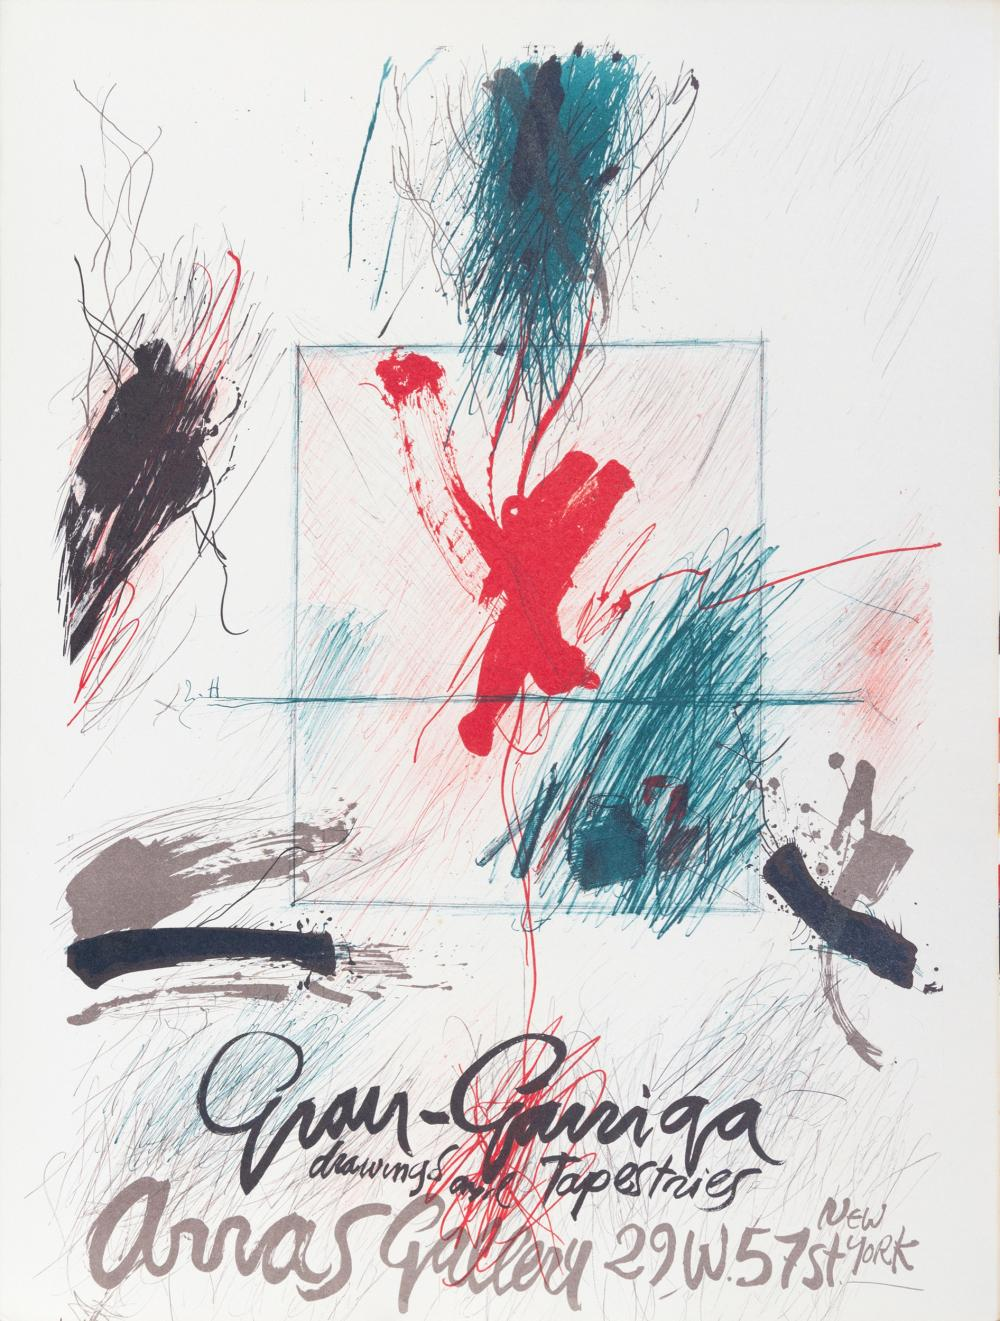 Josep Grau-Garriga, Arras Gallery Poster, Lithograph Poster